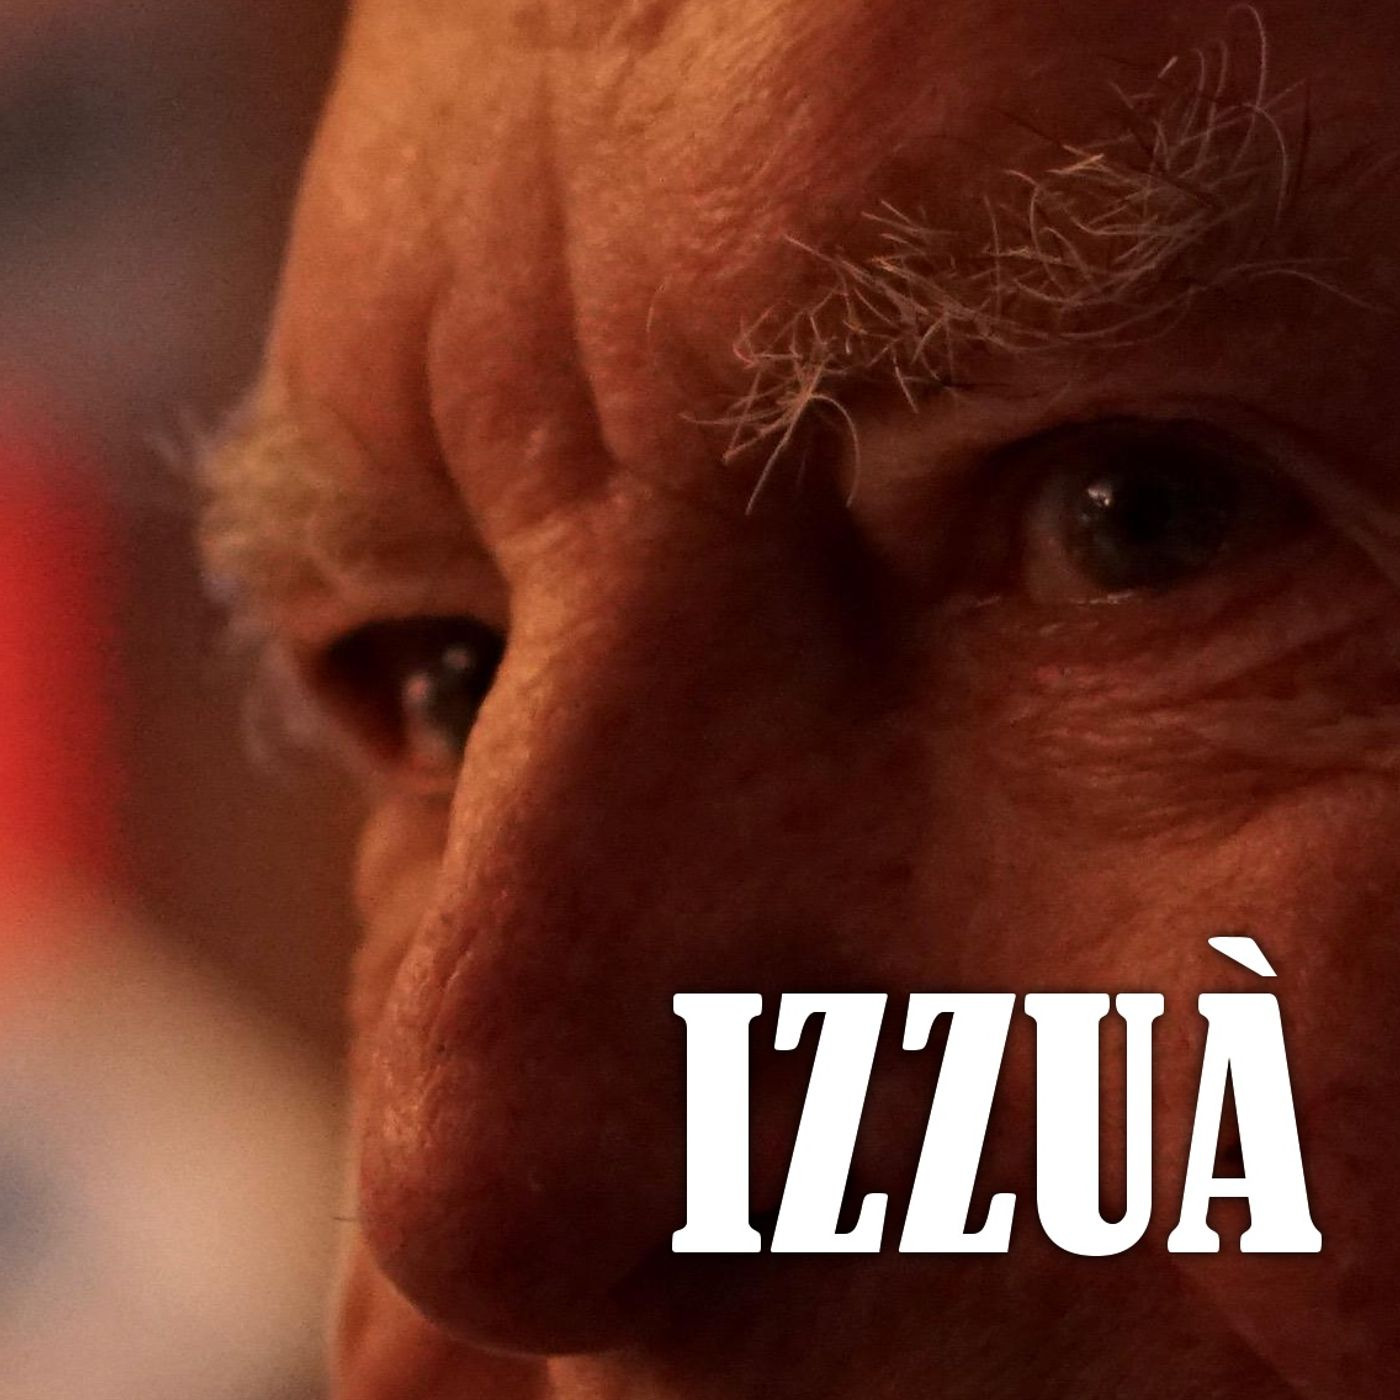 Izzuà